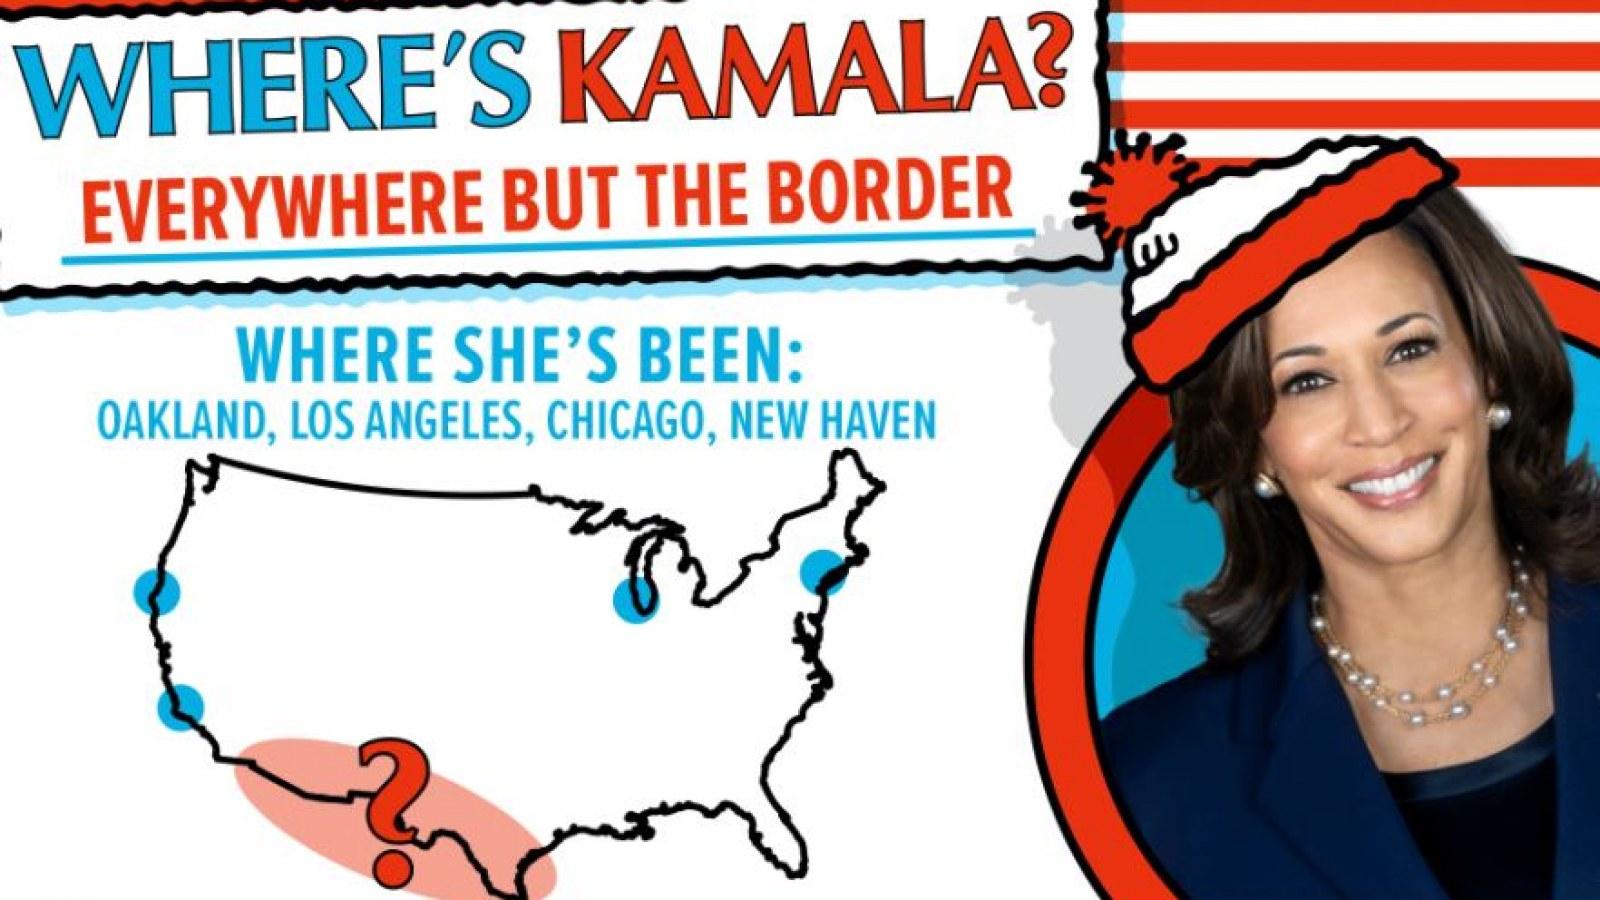 Where's Kamala?': Nikki Haley Mocks VP's Lack of Border Visit With 'Where's  Waldo' Picture